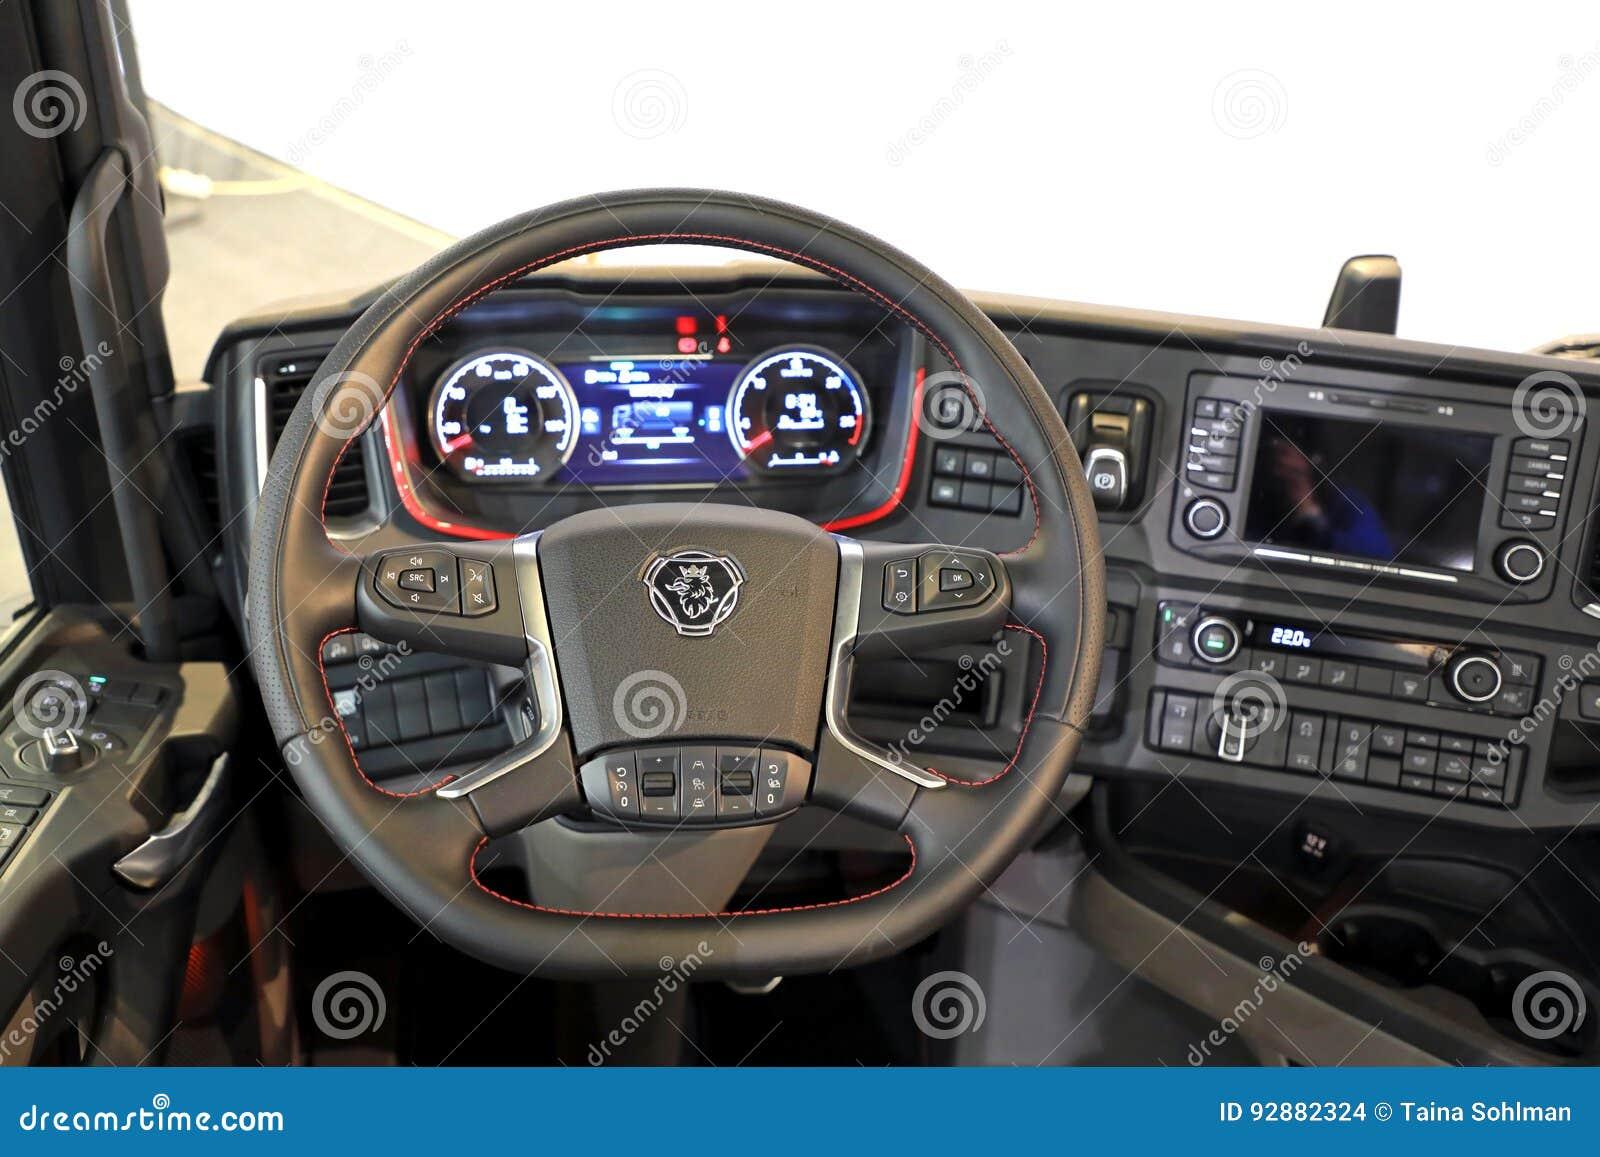 Next Generation Scania Truck Interior Editorial Stock Image